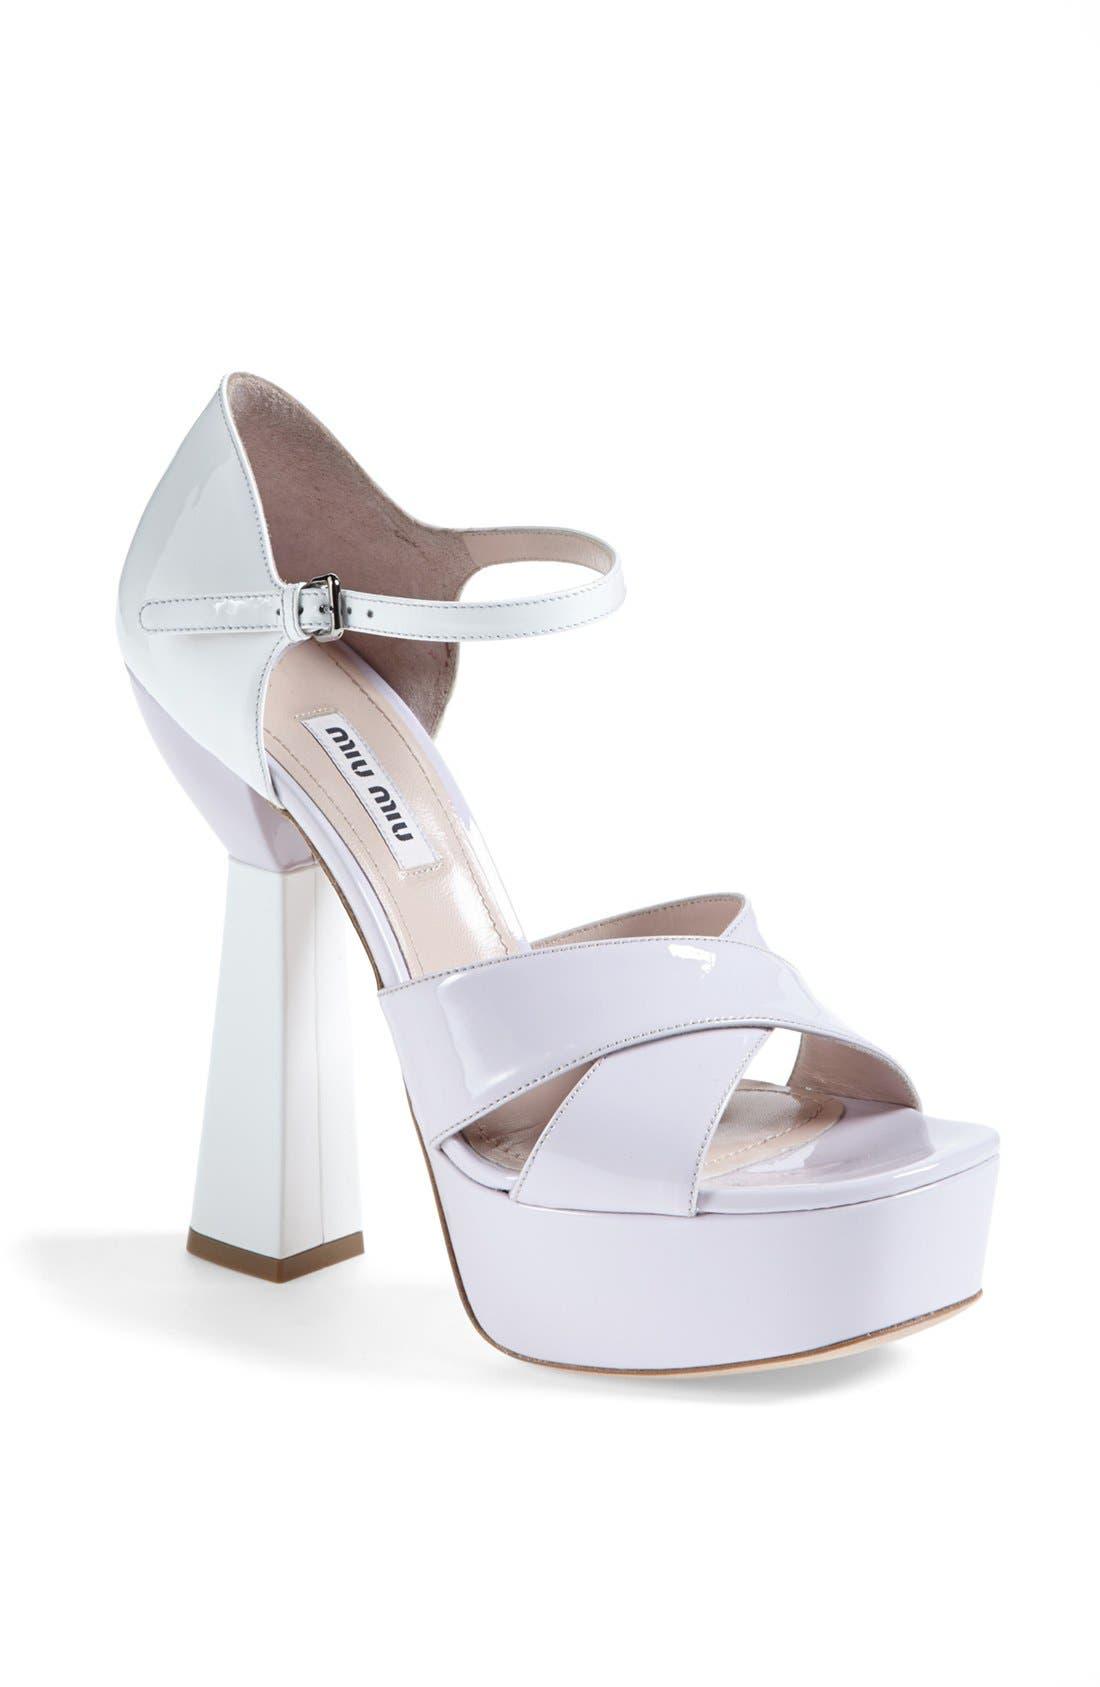 Alternate Image 1 Selected - Miu Miu Mary Jane Platform Sandal